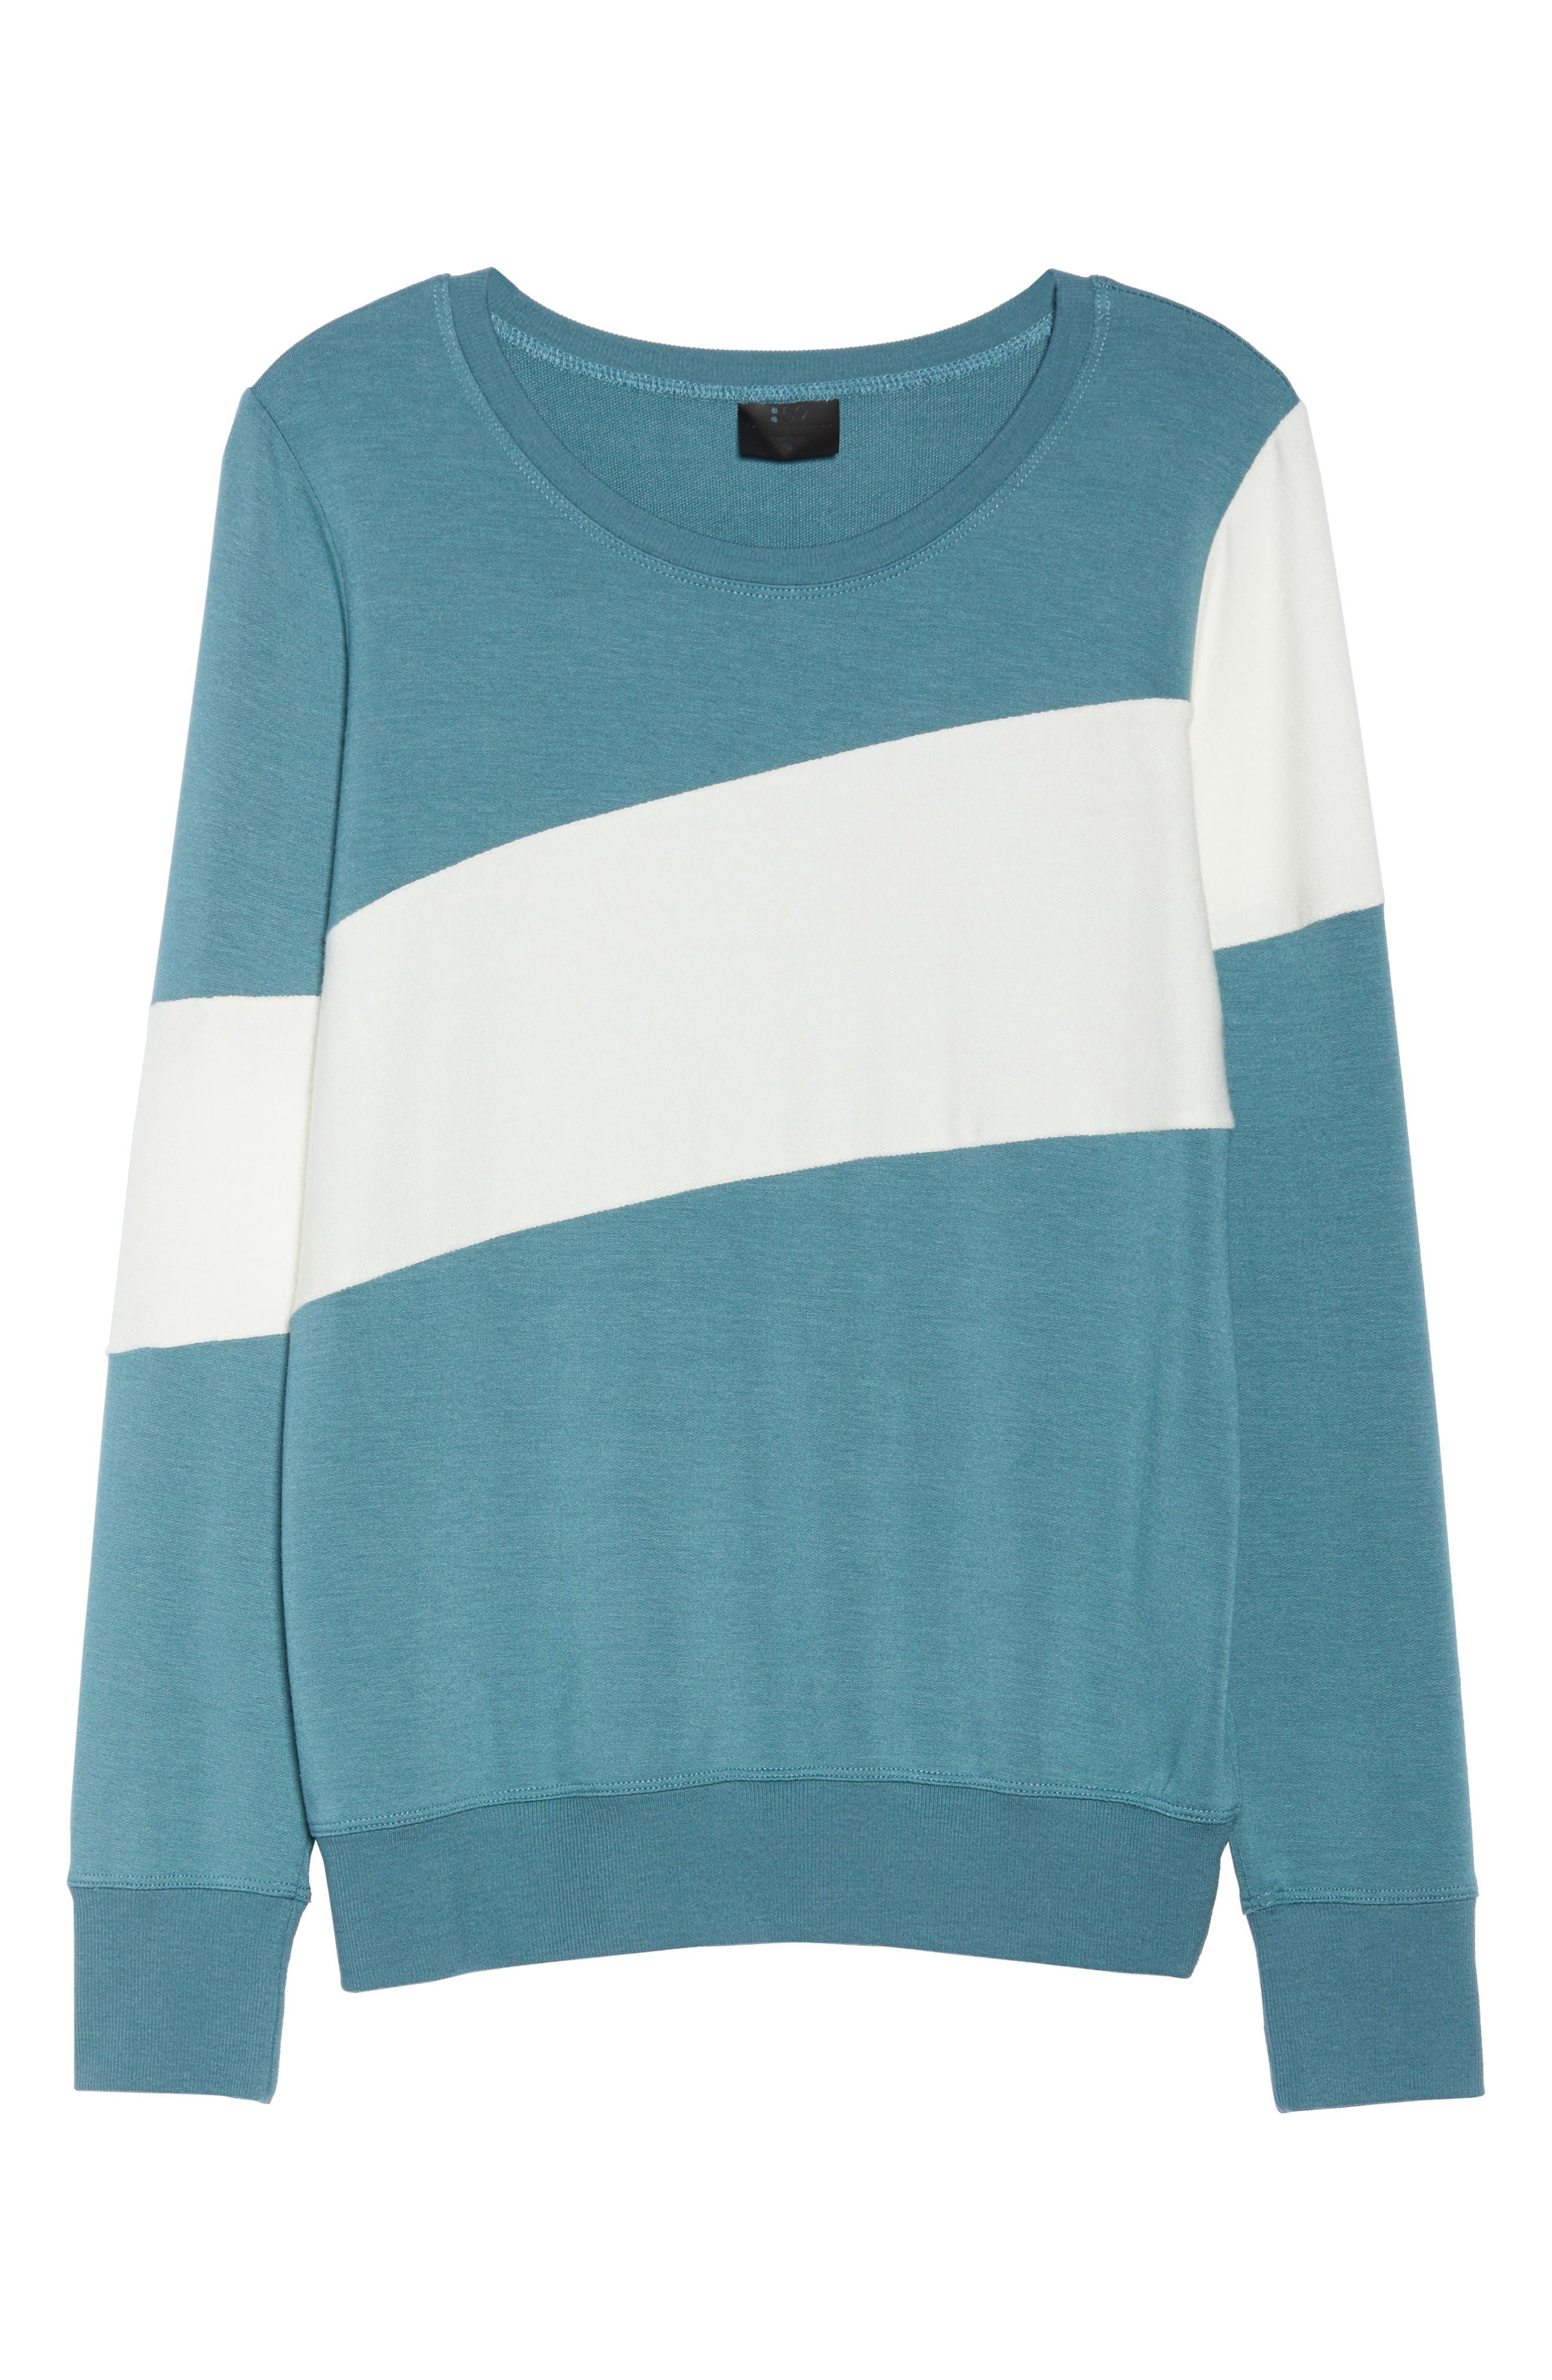 Ramp Sweatshirt,                             Alternate thumbnail 7, color,                             Blue Surf/ Off White